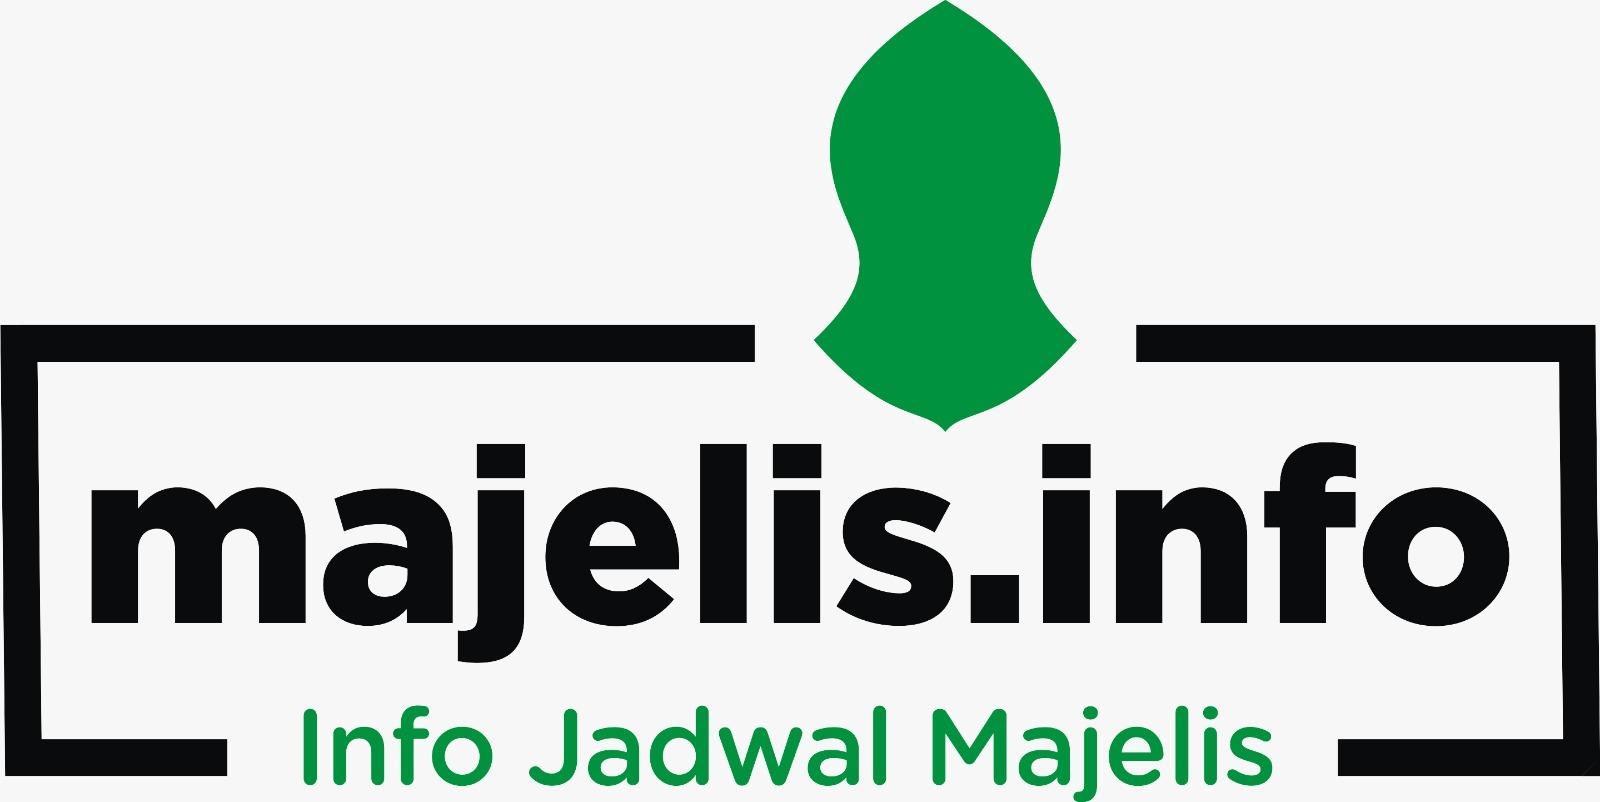 @jadwalmajelis's cover photo for 'Majelis.Info Jadwal Majelis dan Islamic Event'